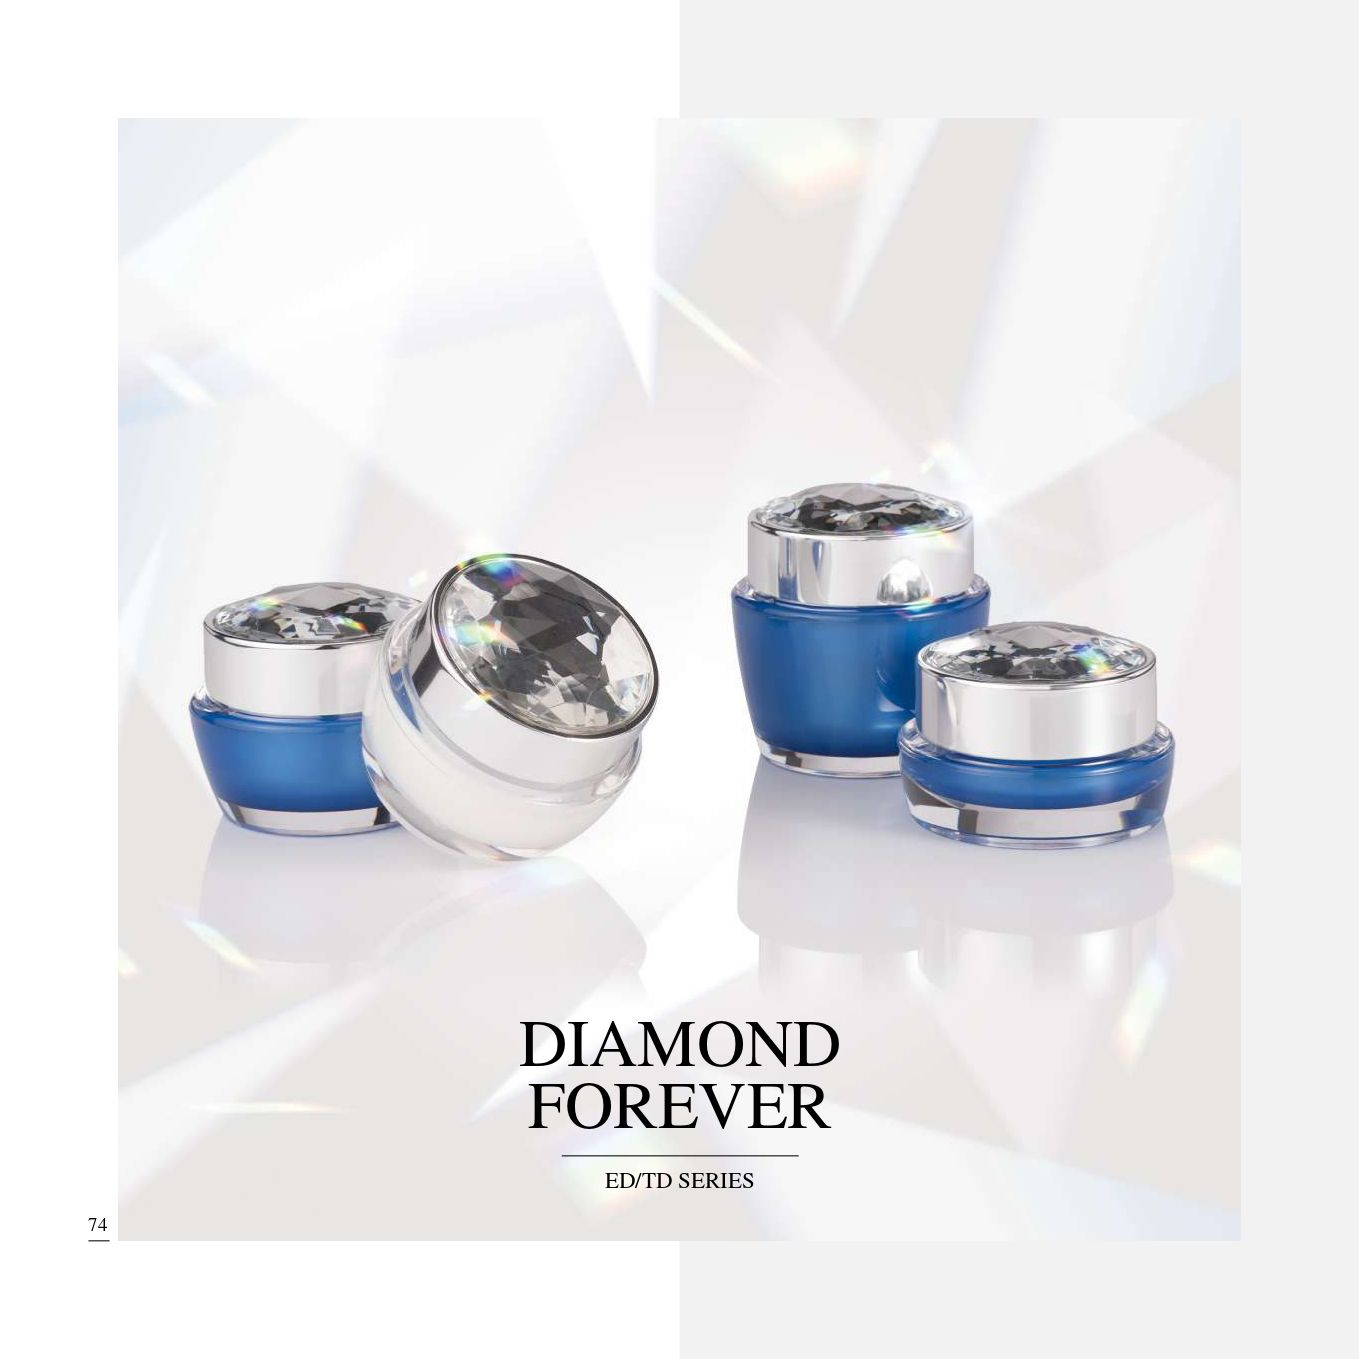 Diamond Cap Acrylic Luxury Cosmetic/Skincare Packaging - Cosmetic Packaging Collection - Diamond Forever